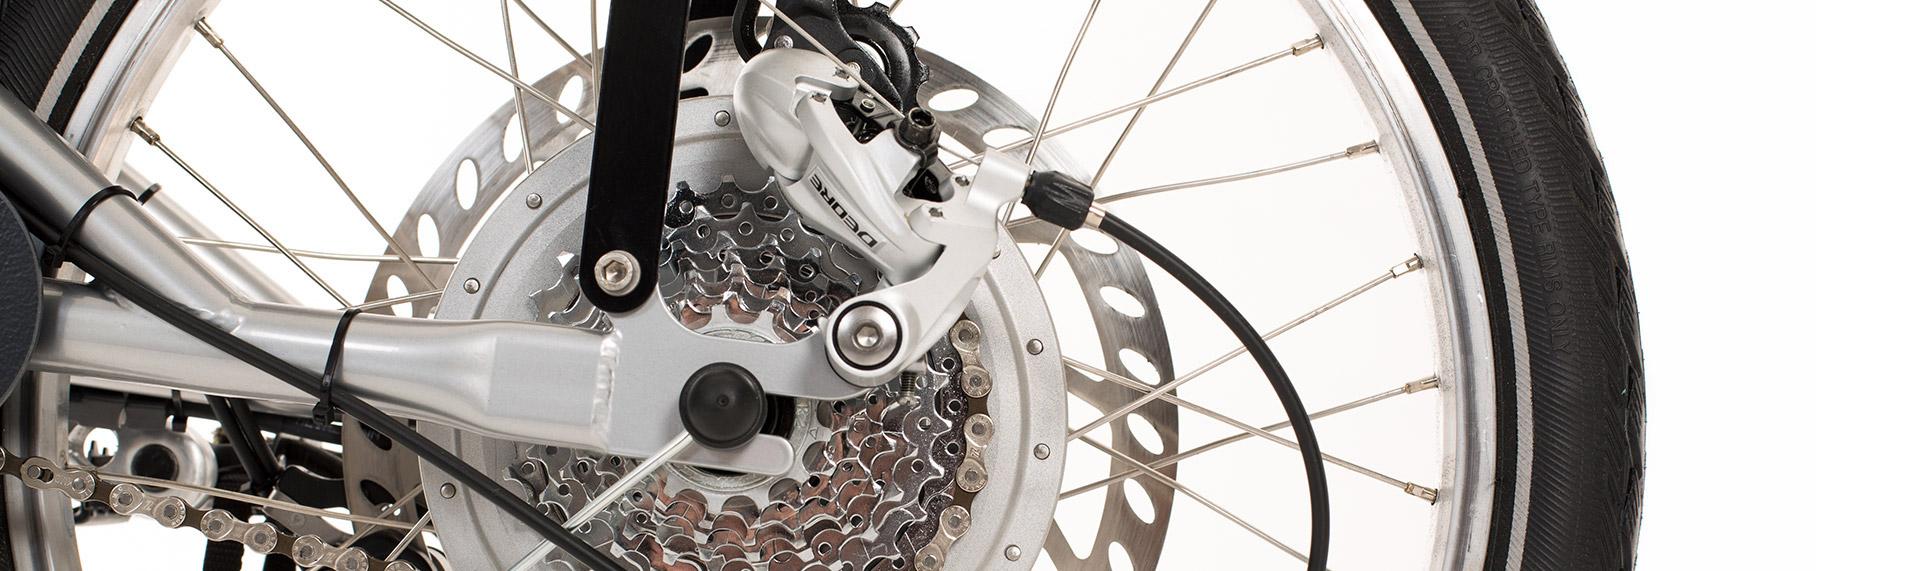 speedy-pedalofit-1920-2